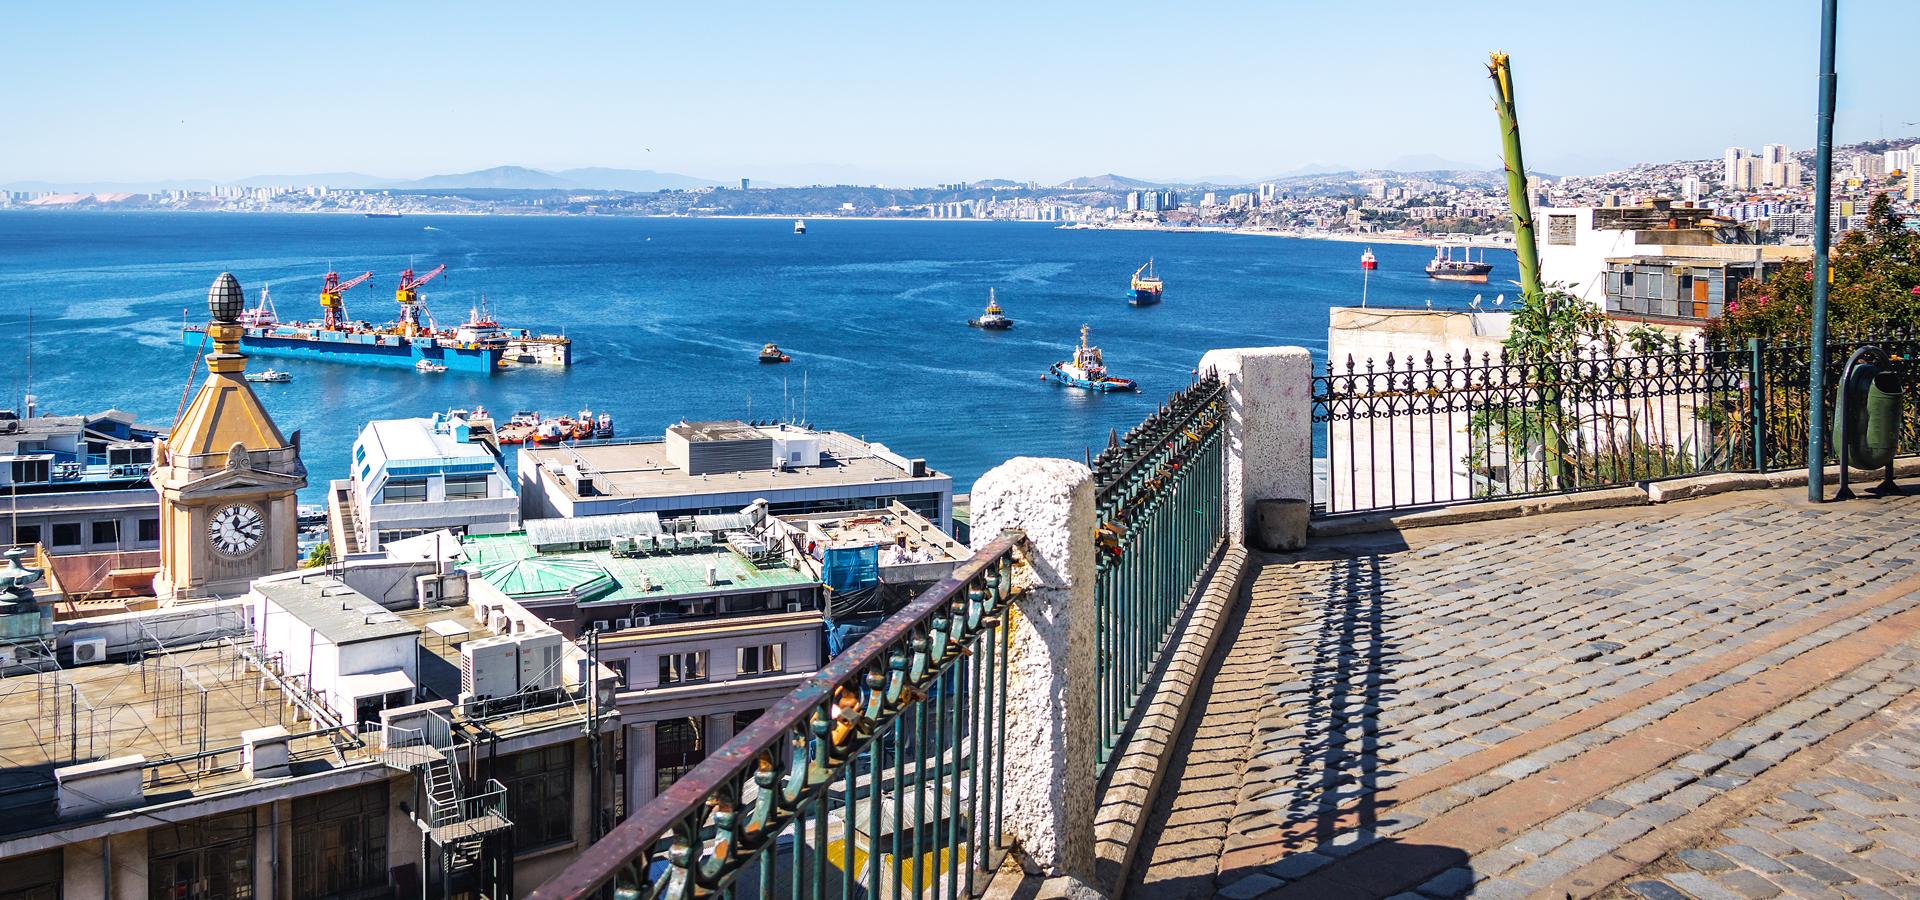 Peer-to-peer advisory in Viña del Mar, Region de Valparaiso, Chile